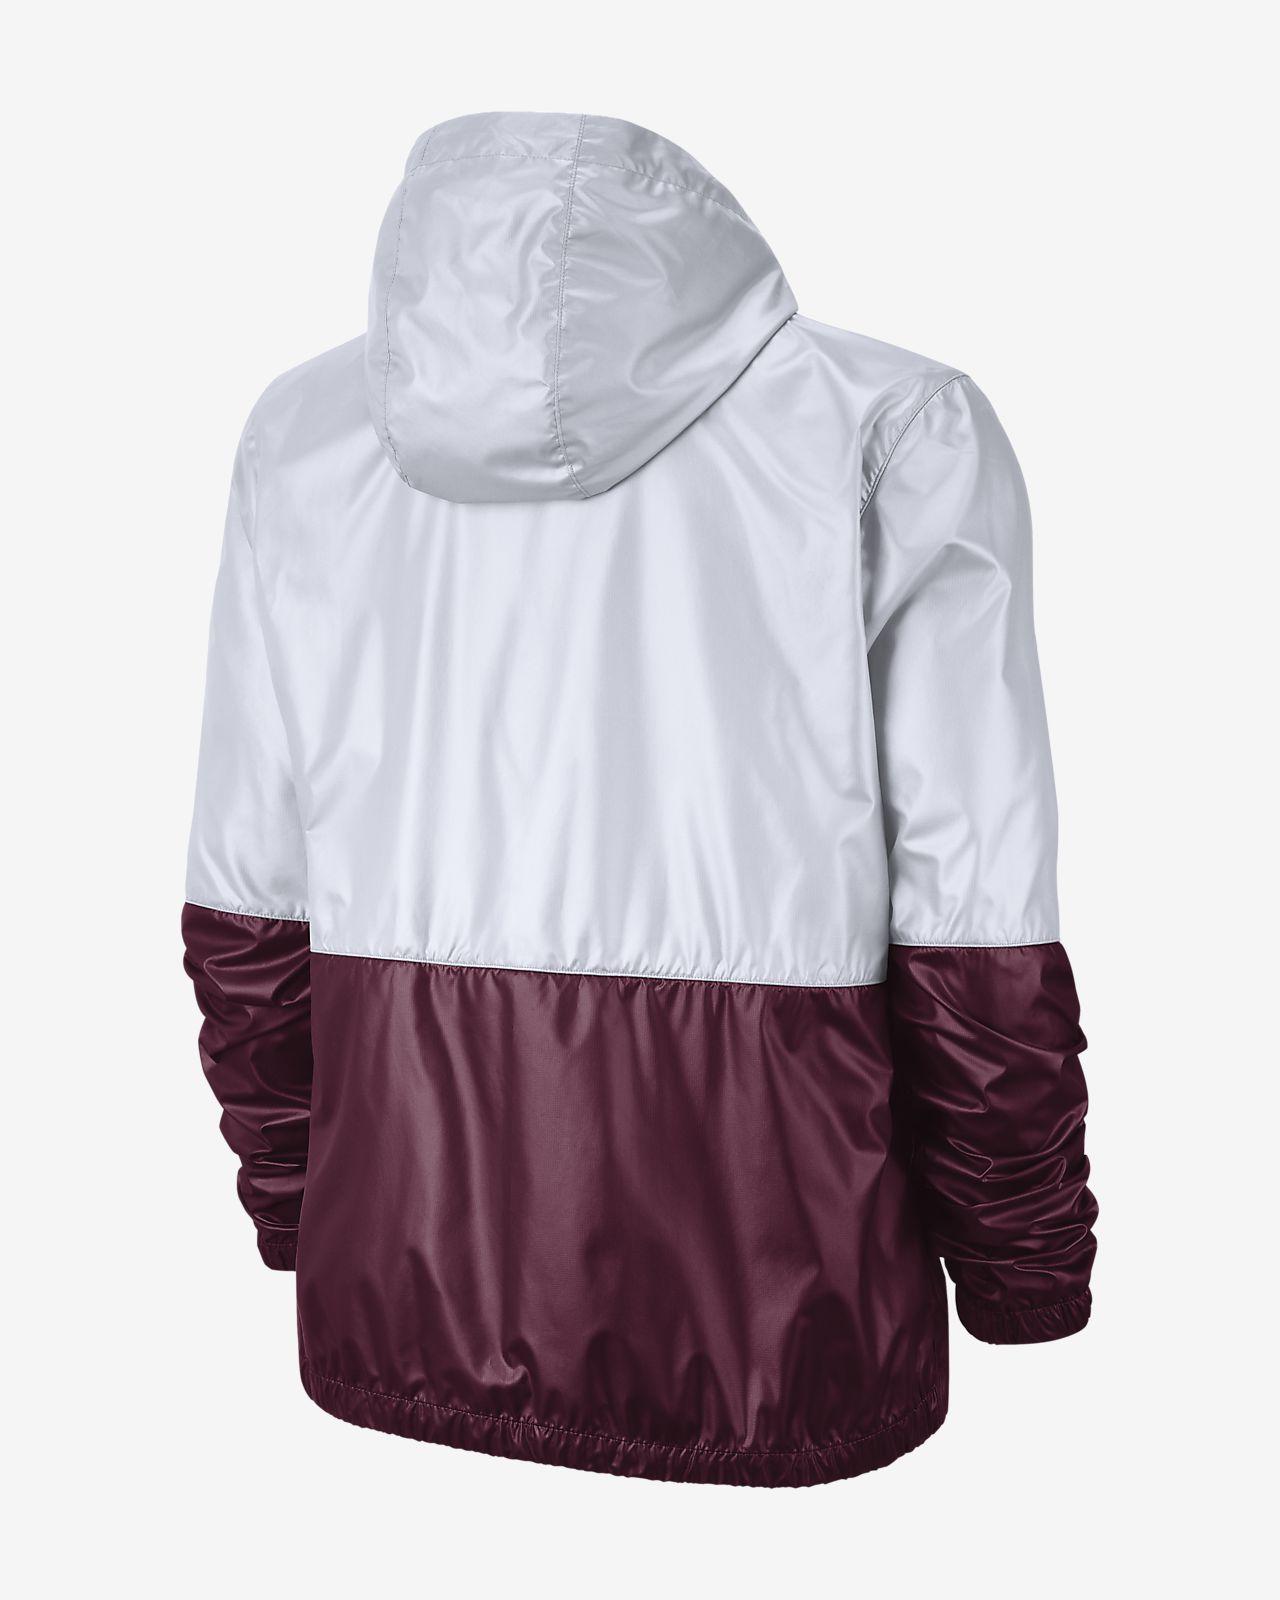 Nike College Anorak (Virginia Tech) Women's Jacket